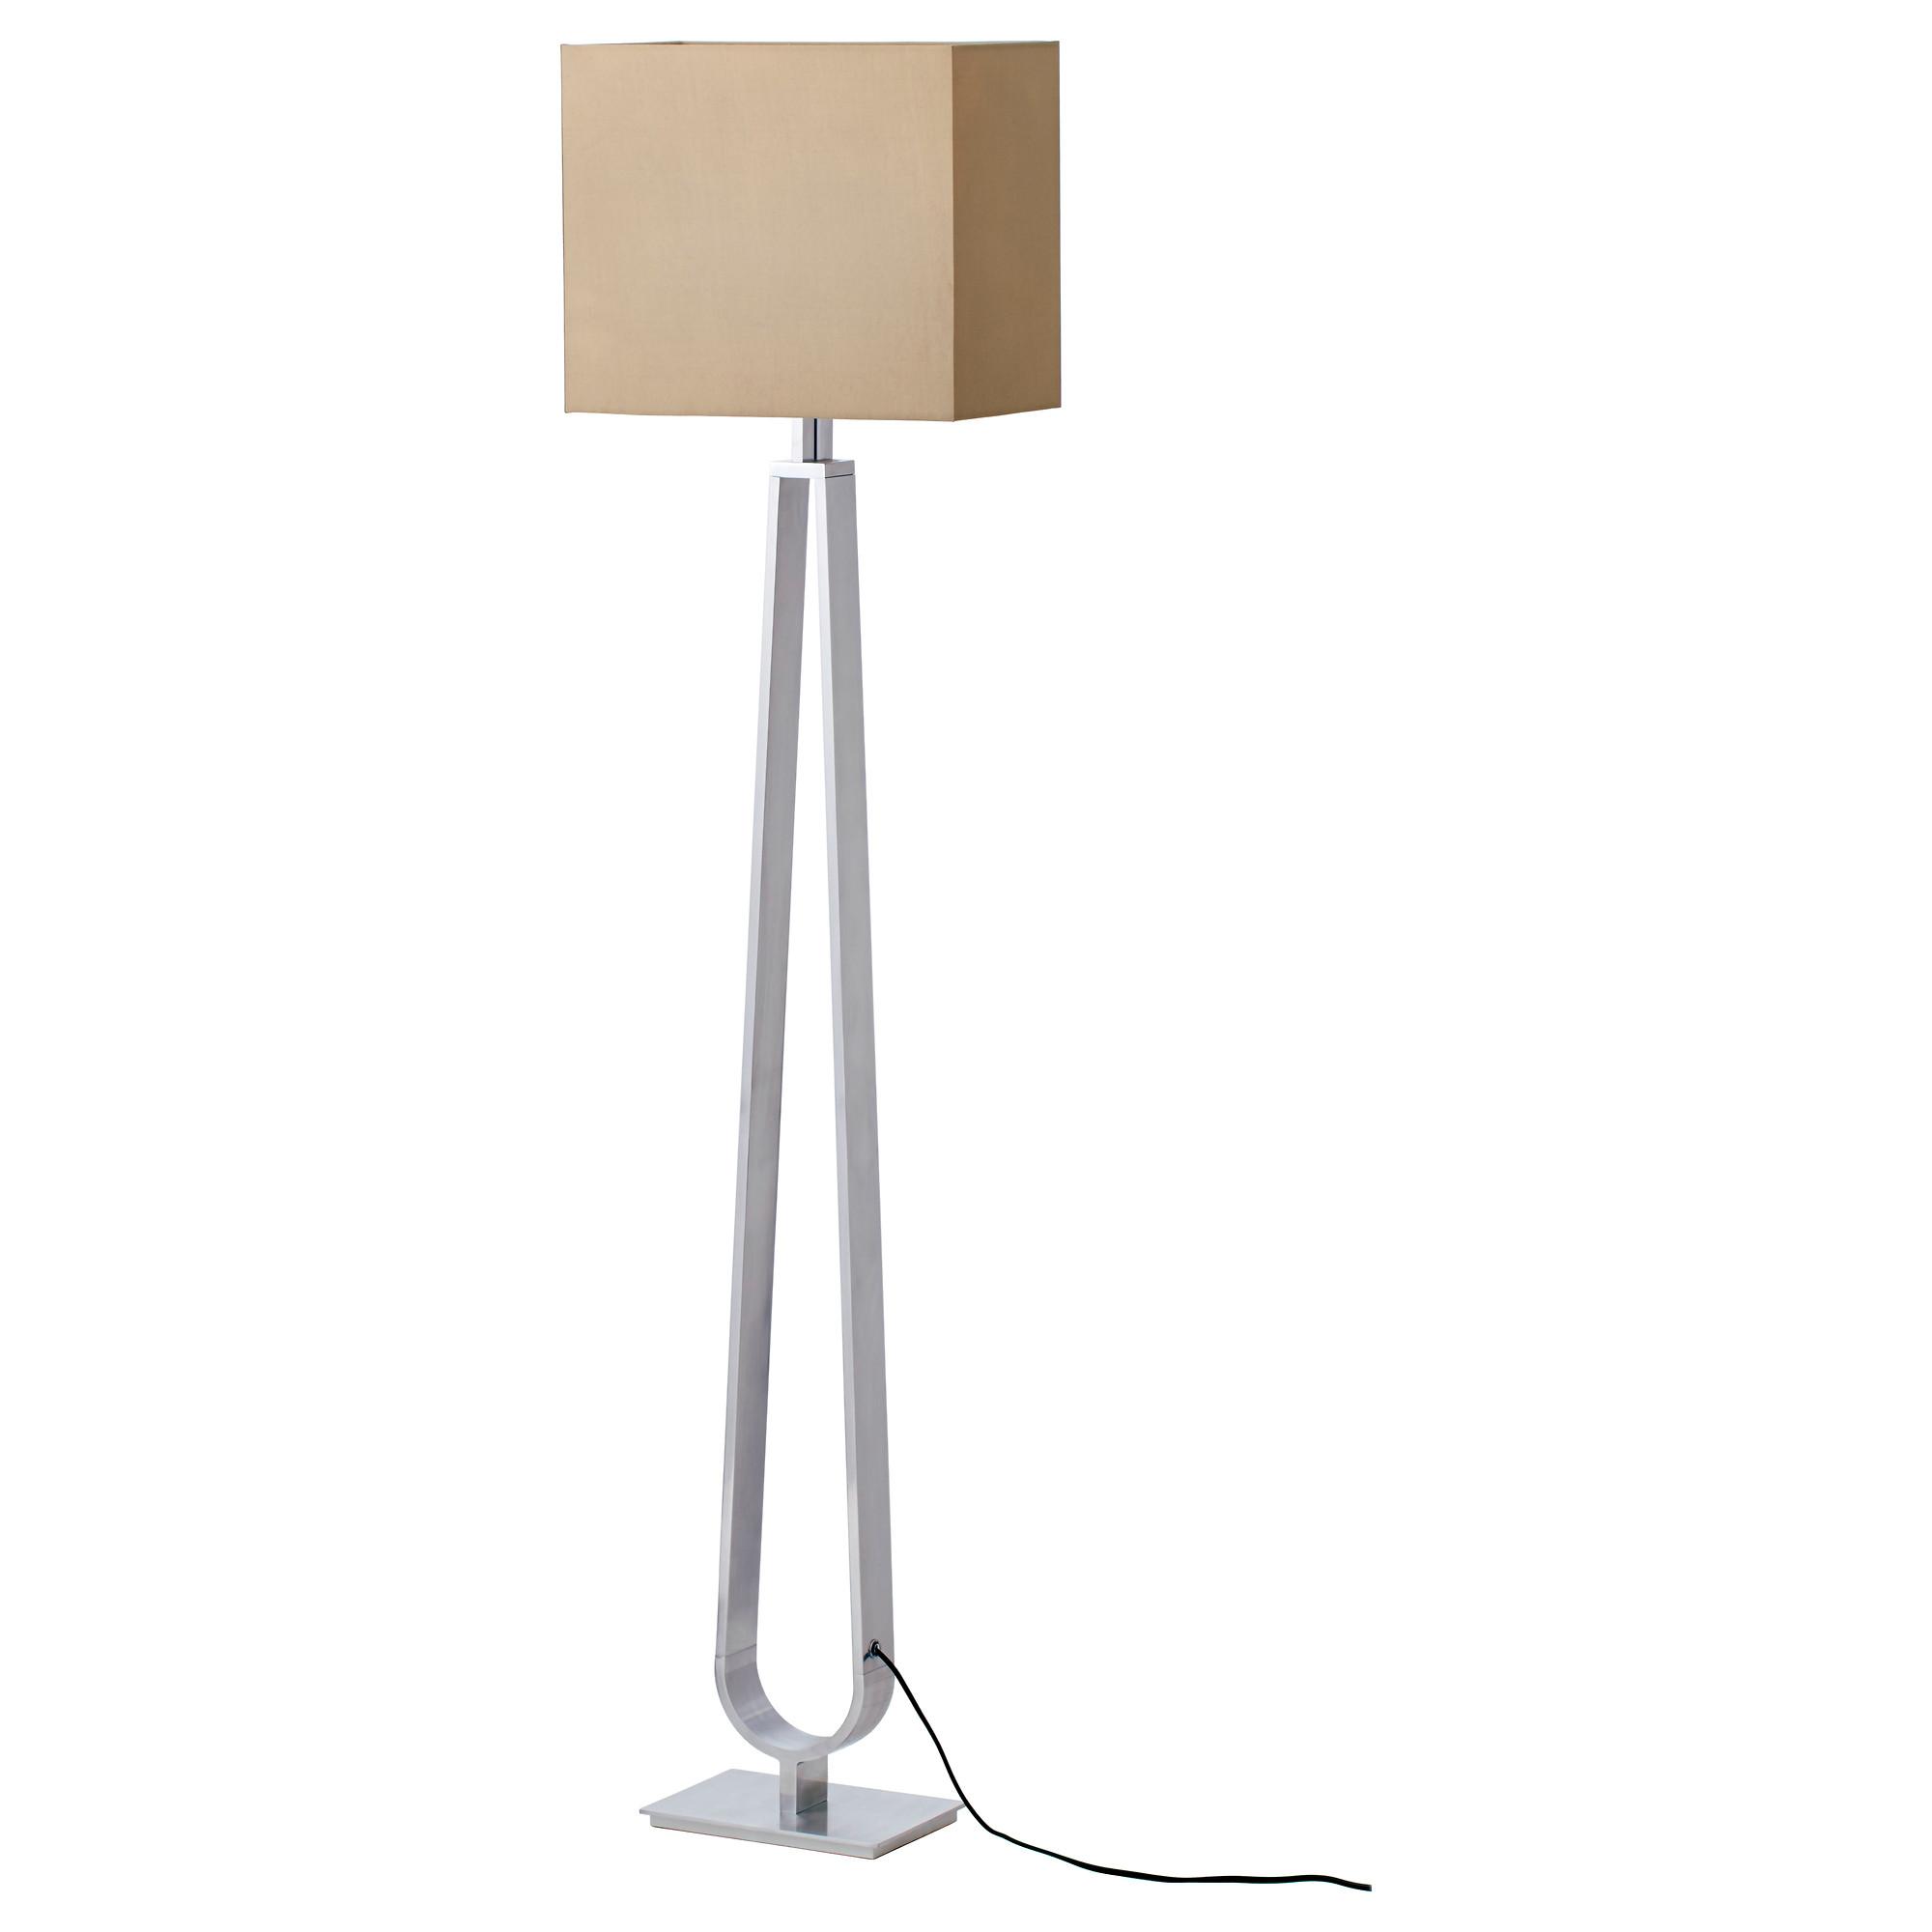 Klabb Ikea Floor Lamps Komnit Store